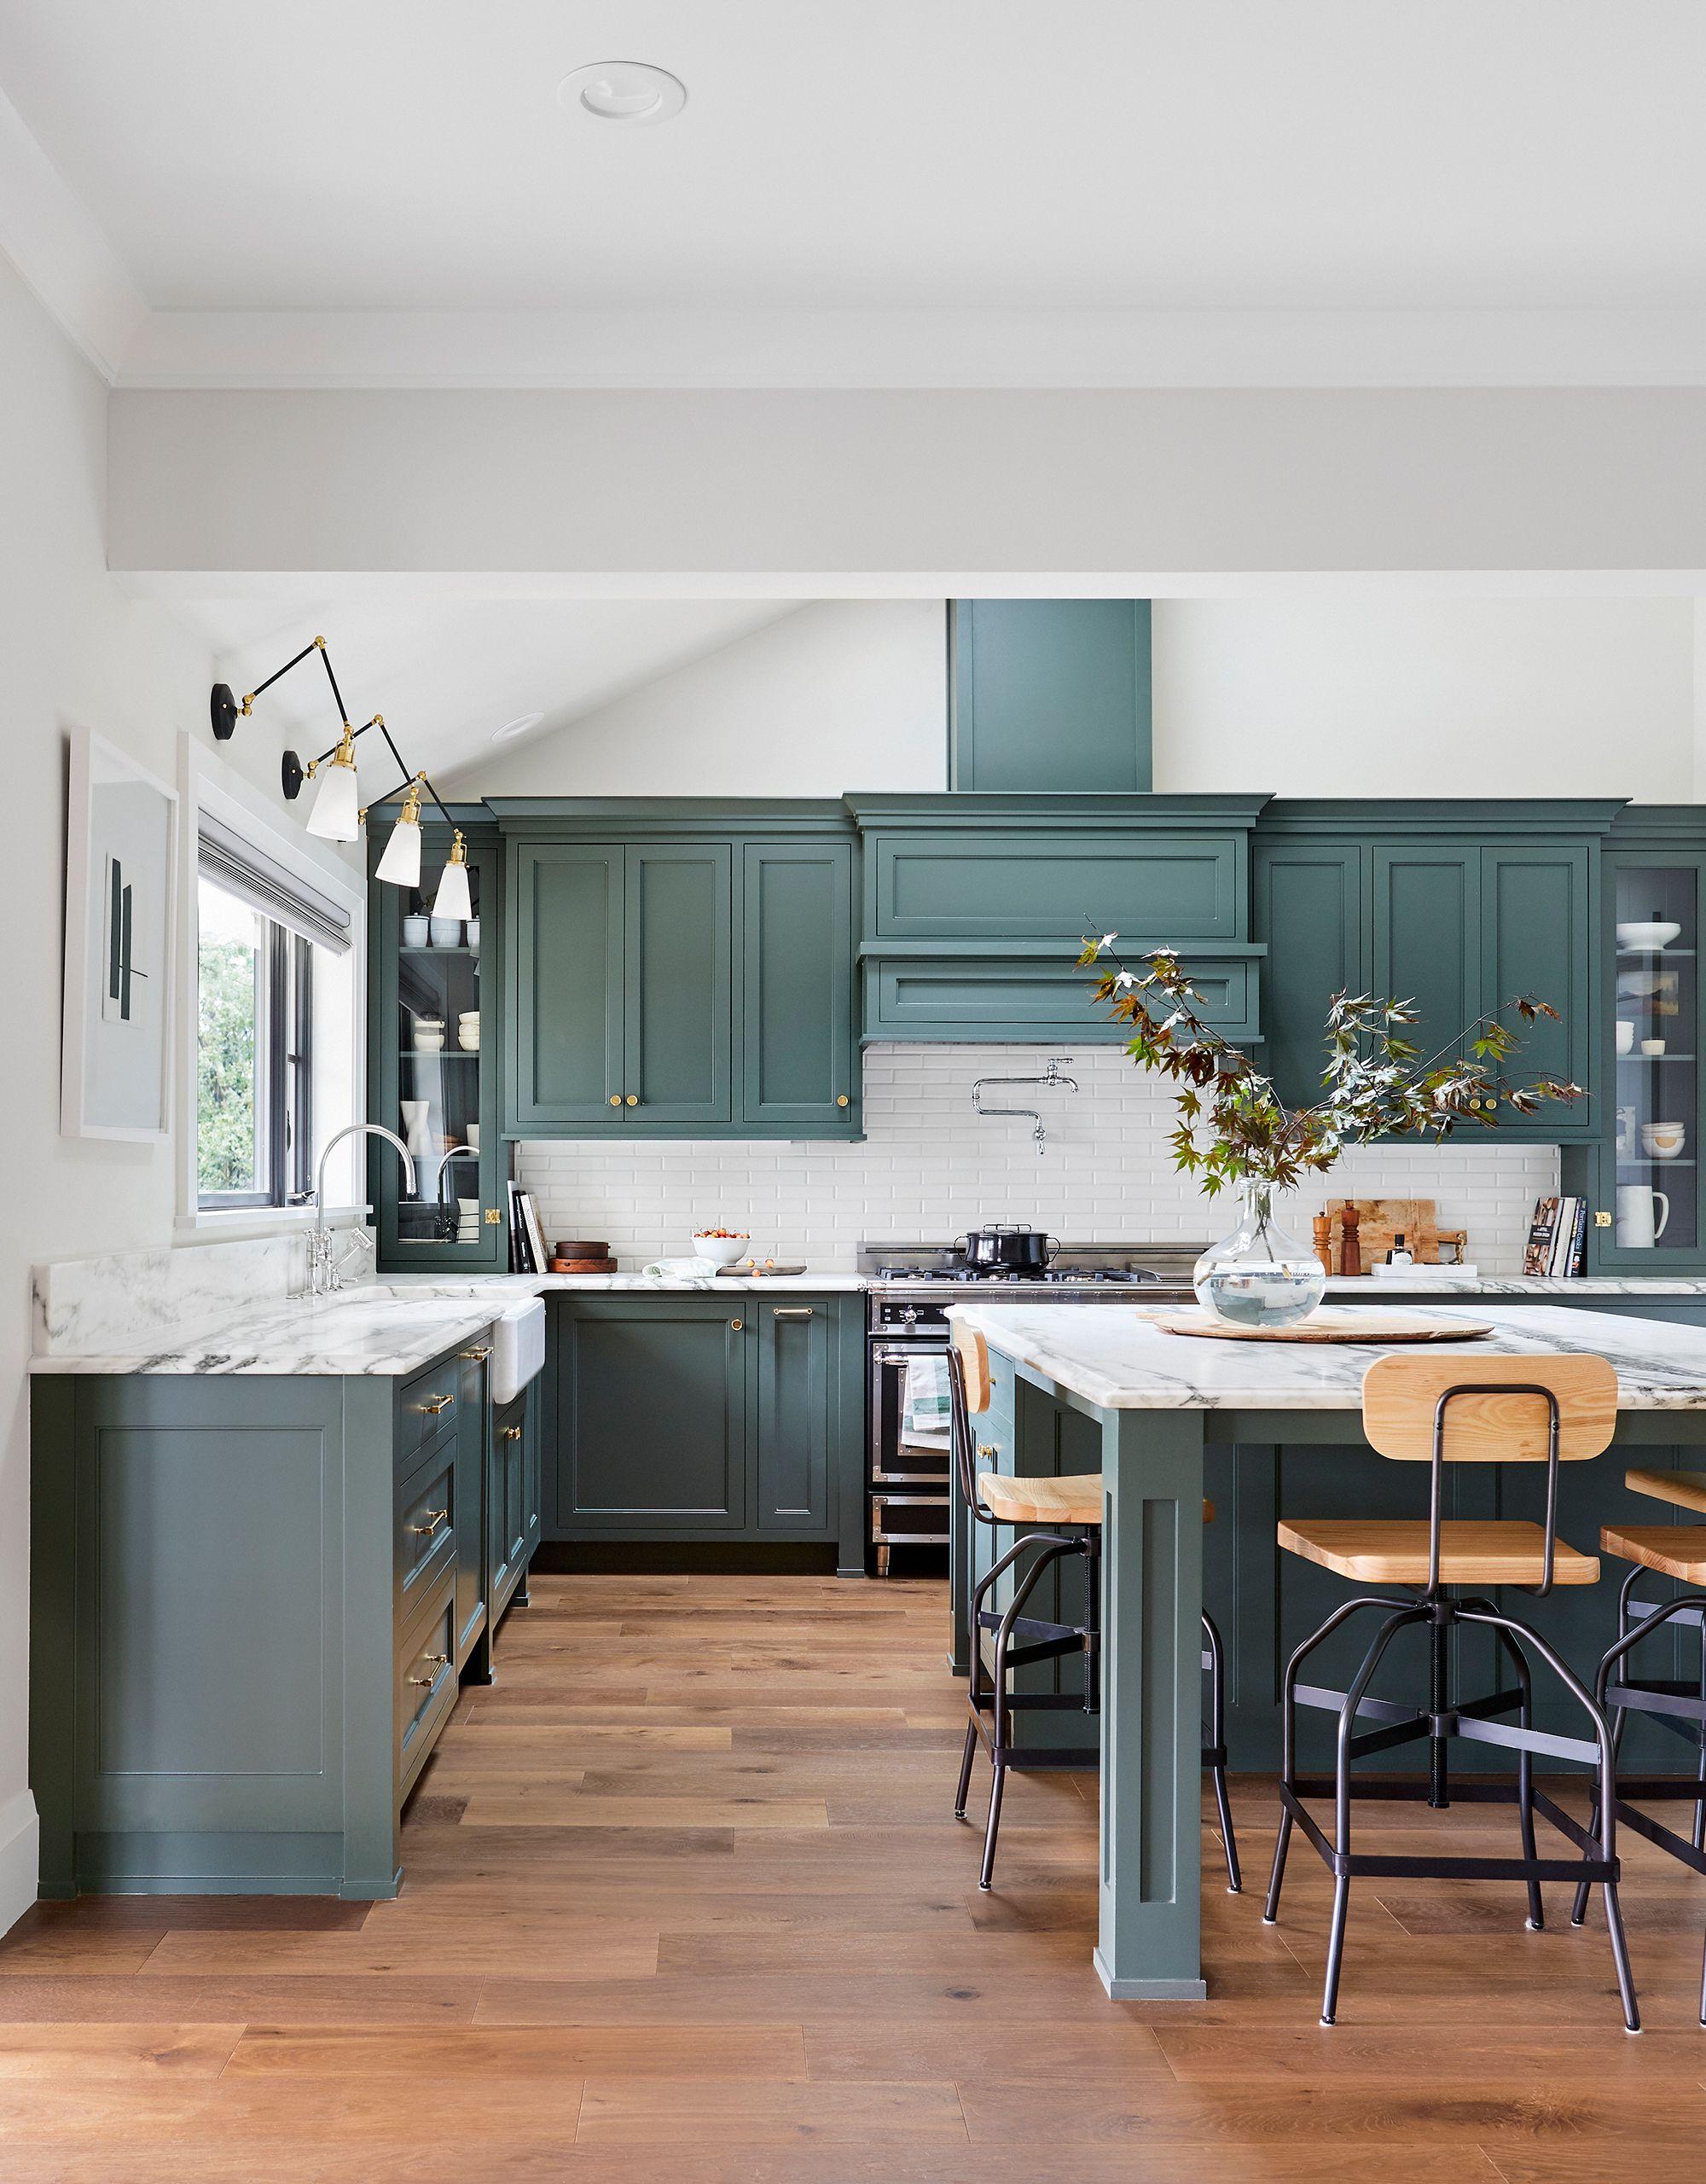 50 Kitchen Cabinet Design Ideas 2019 , Unique Kitchen